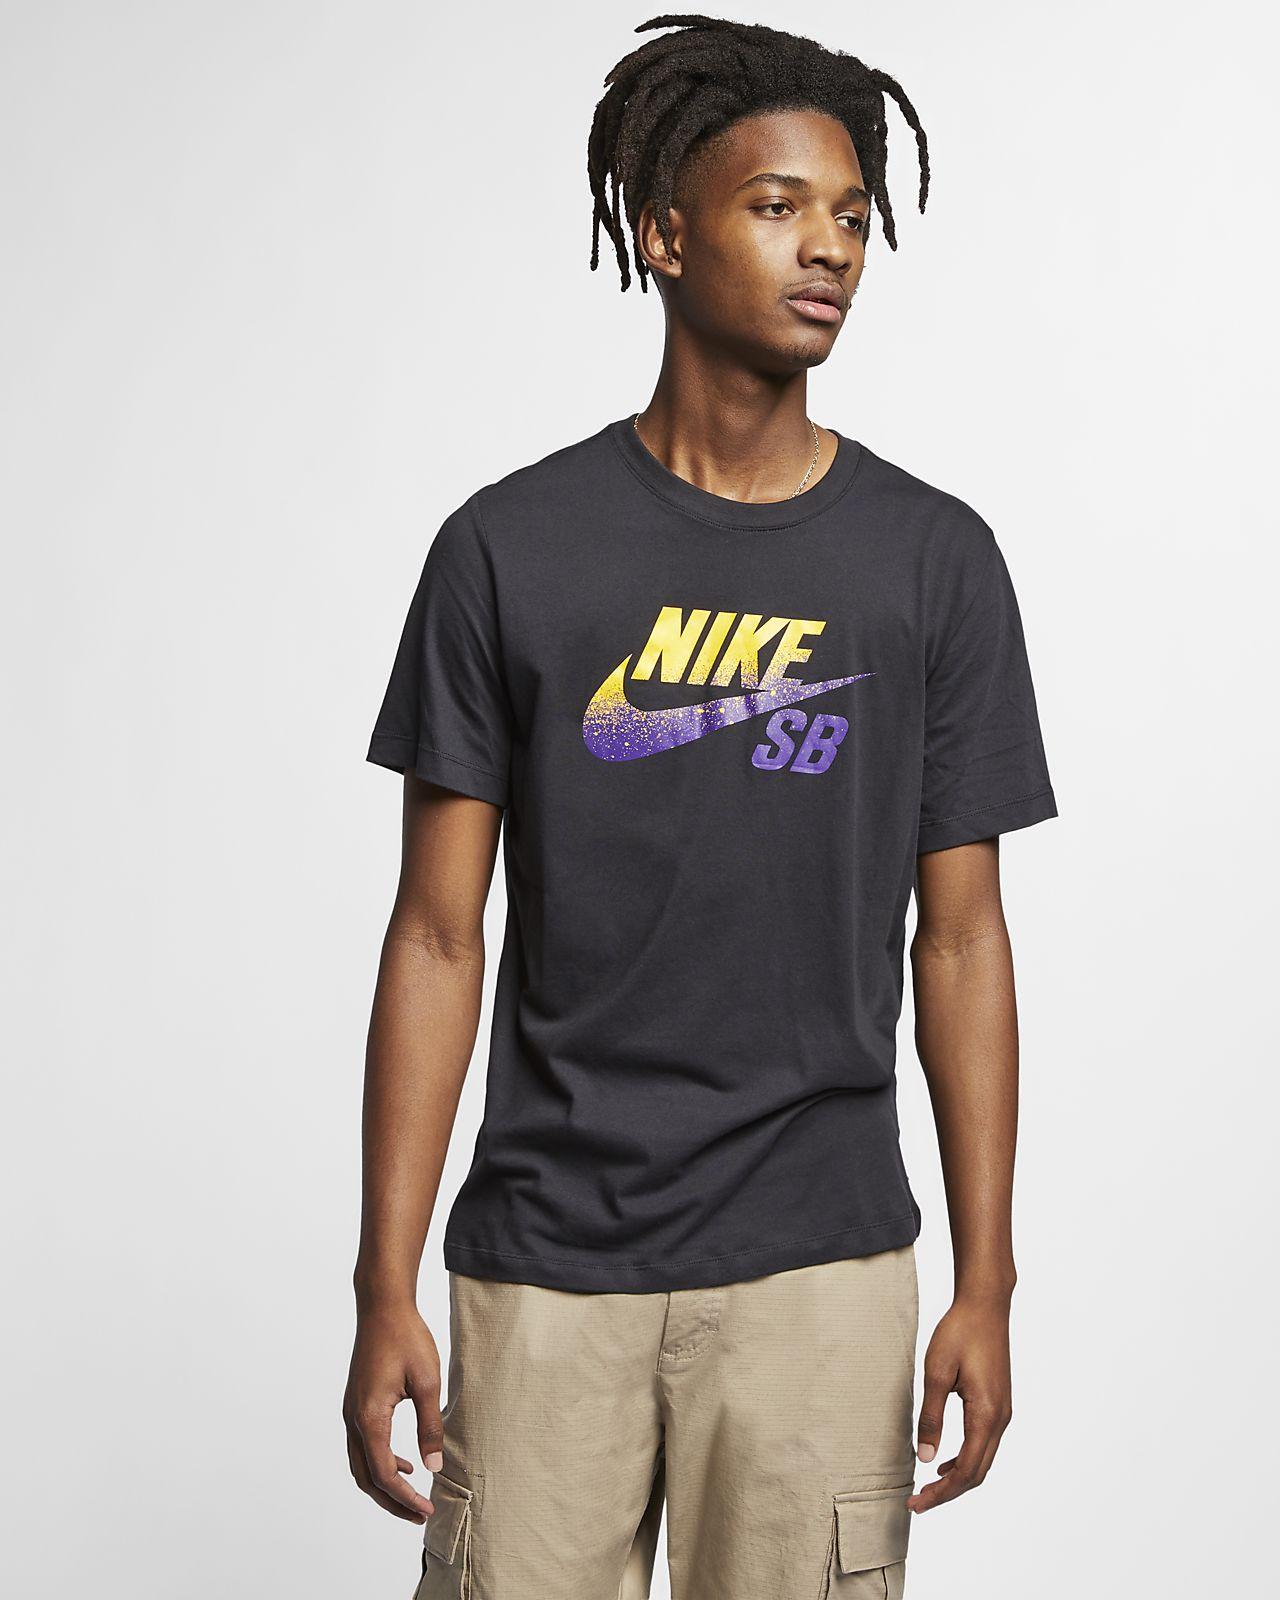 Nike SB Dri-FIT Skateshirt met logo voor heren